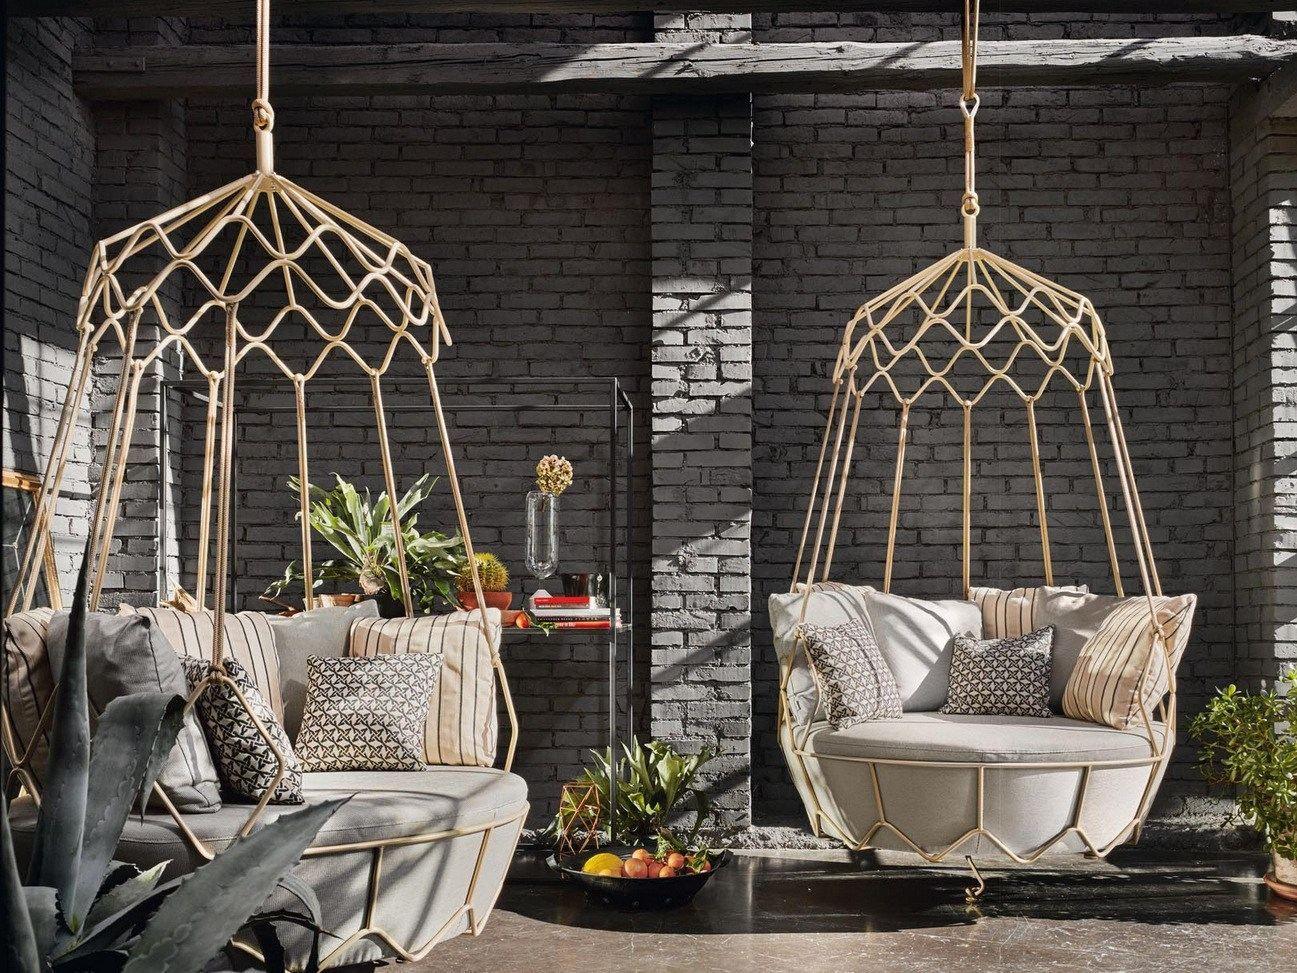 Schön GRAVITY Garden Hanging Chair By Roberti Rattan Design Technical Emotions